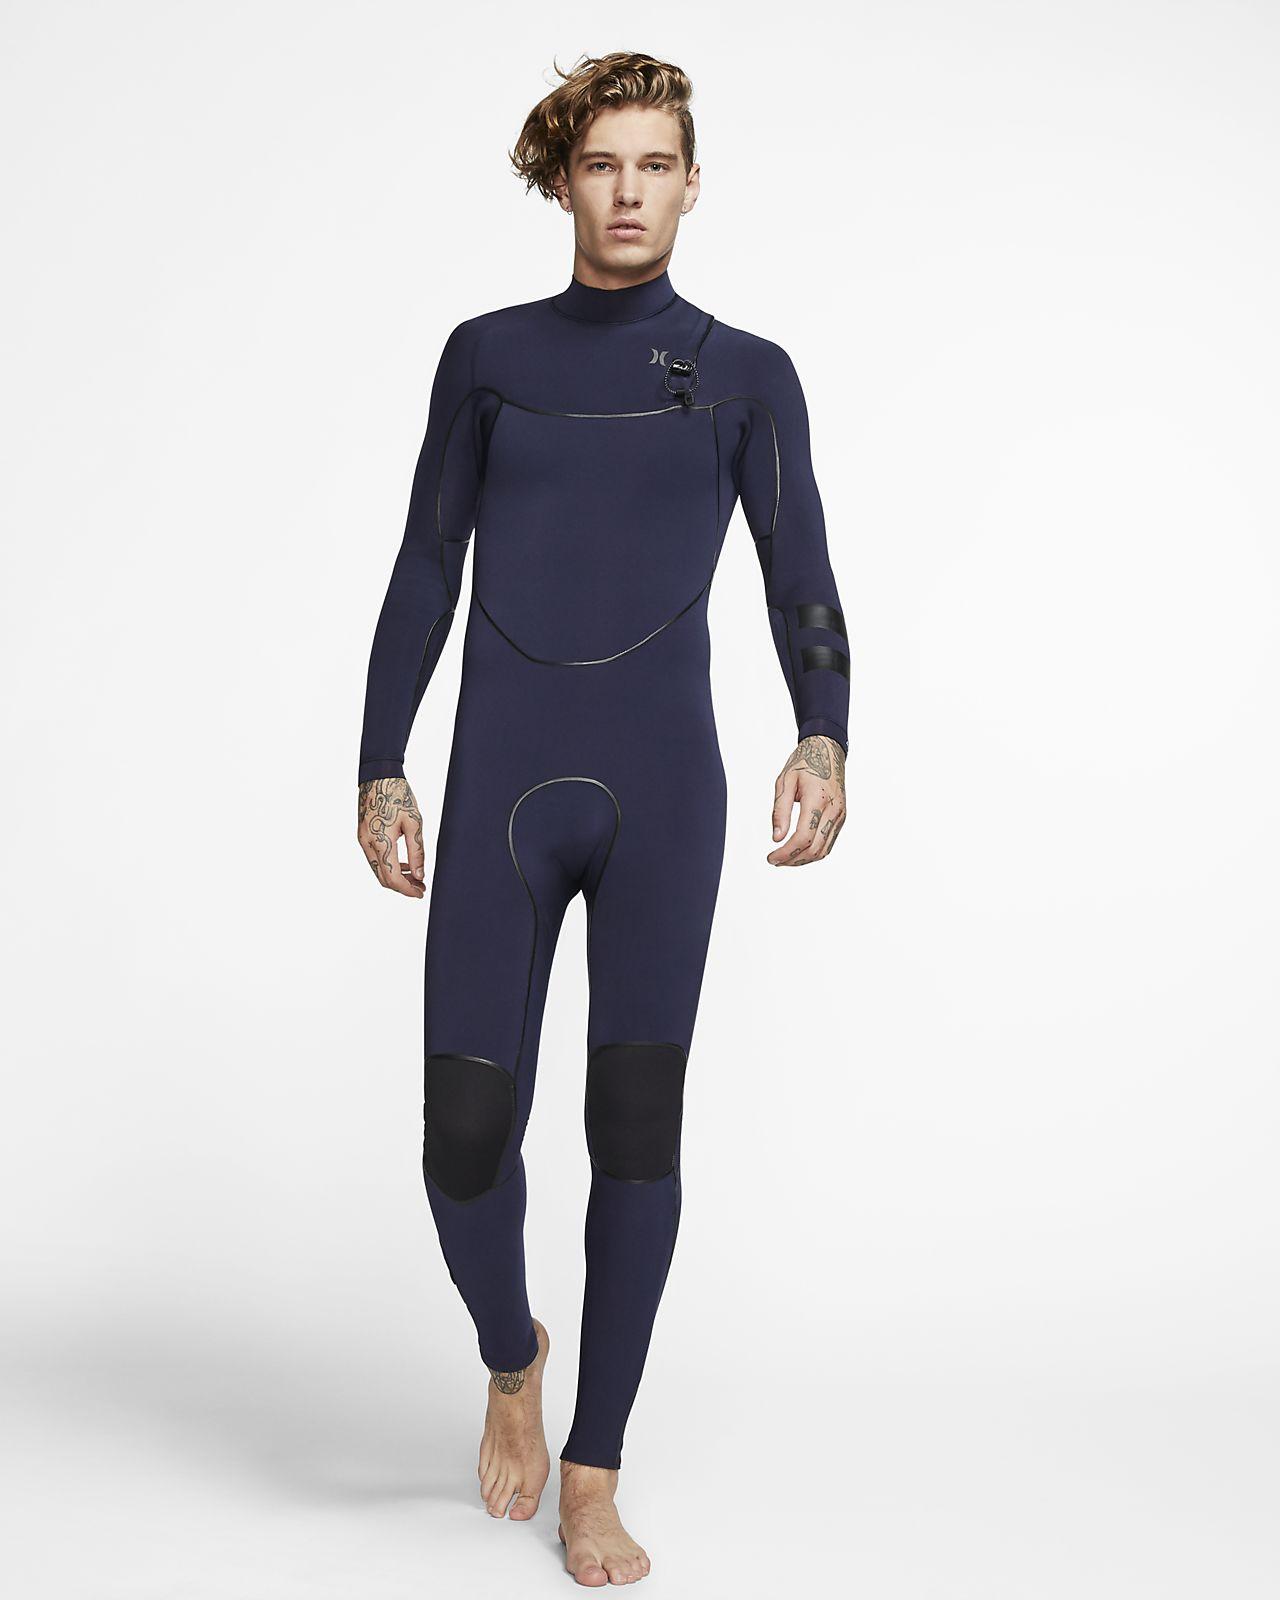 Hurley Advantage Max 3/2mm Fullsuit Erkek Wetsuit'i